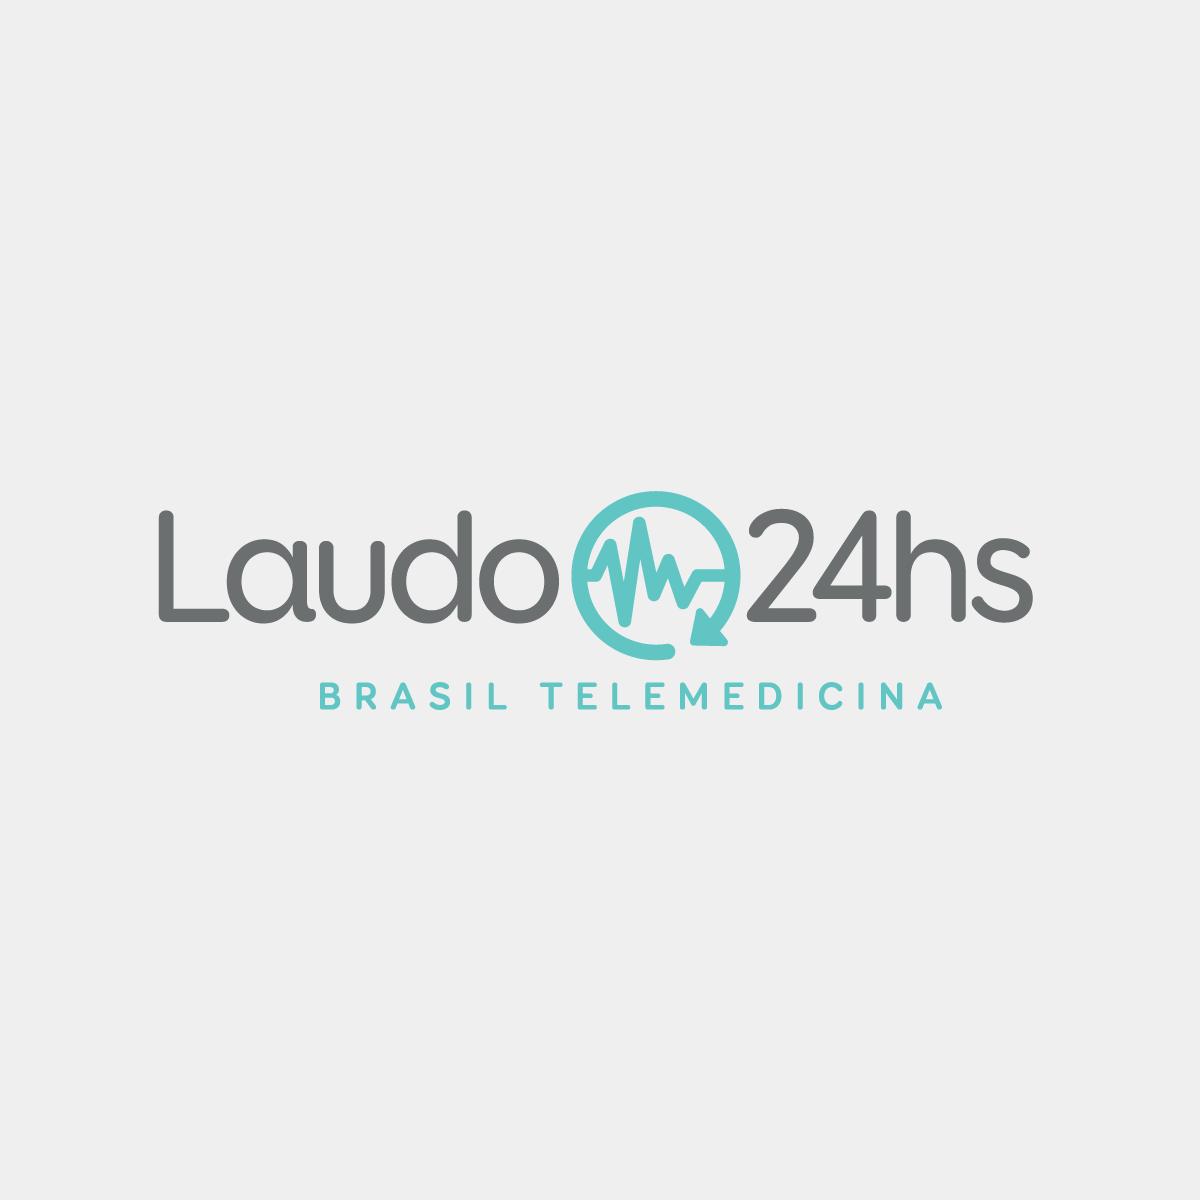 https://brasiltelemedicina.com.br/wp-content/uploads/2016/07/Website_Prosutos_Laudo24hs-1200x1200.png